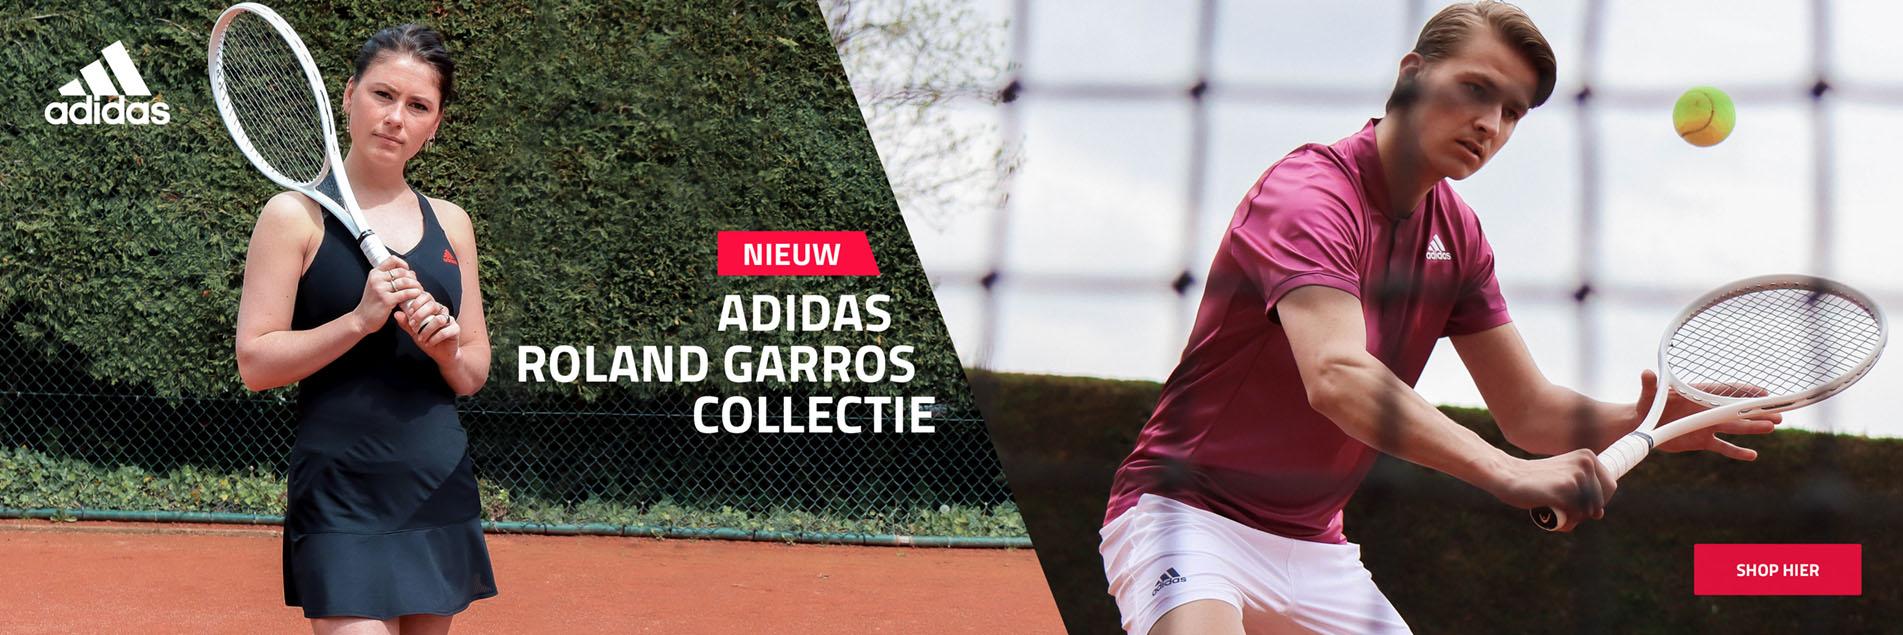 adidas Roland Garros